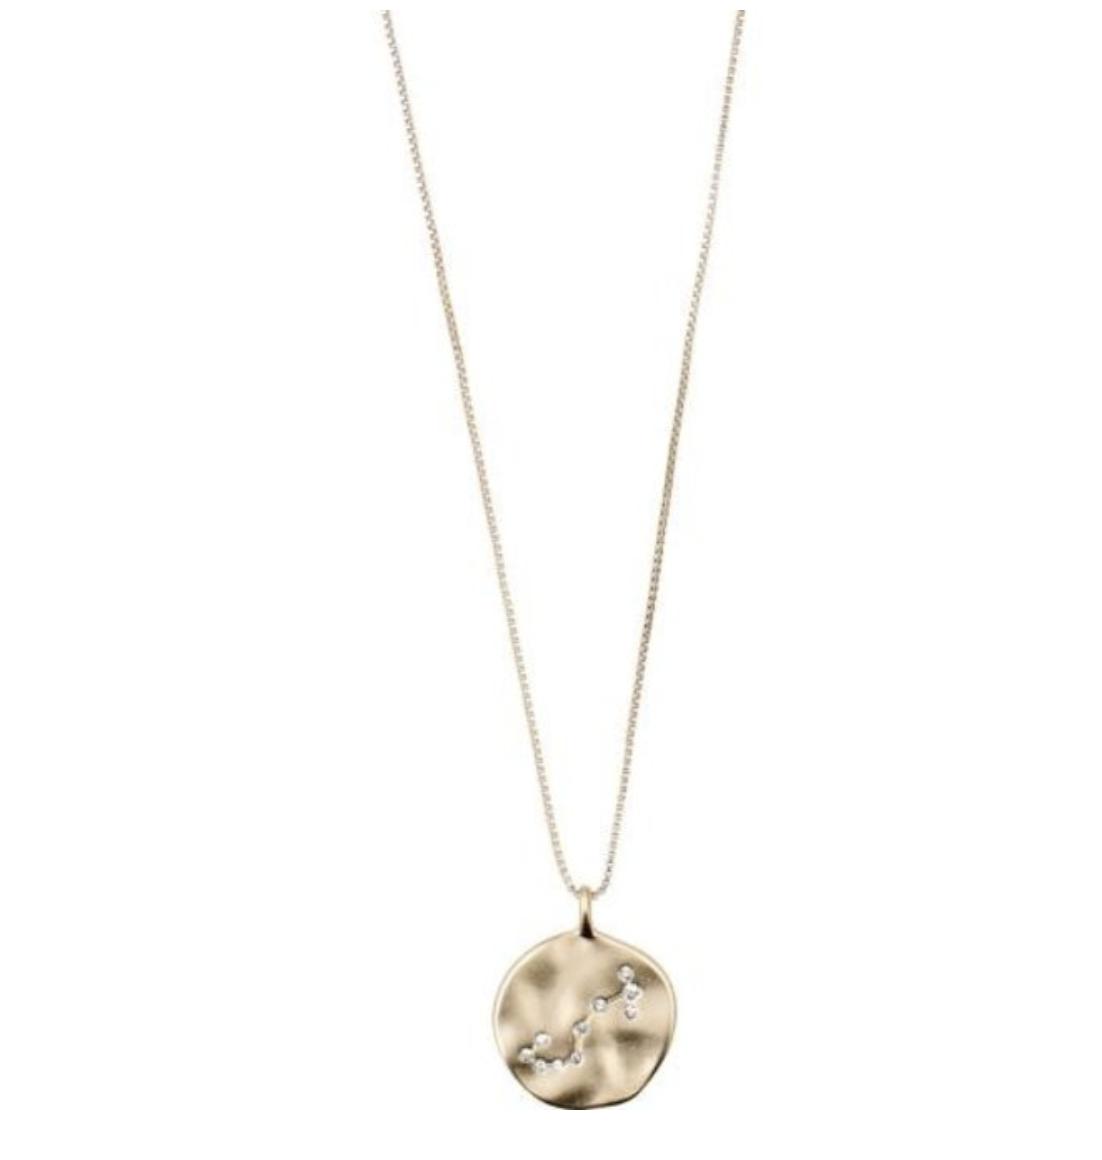 Horoscope Necklace Scorpio Gold